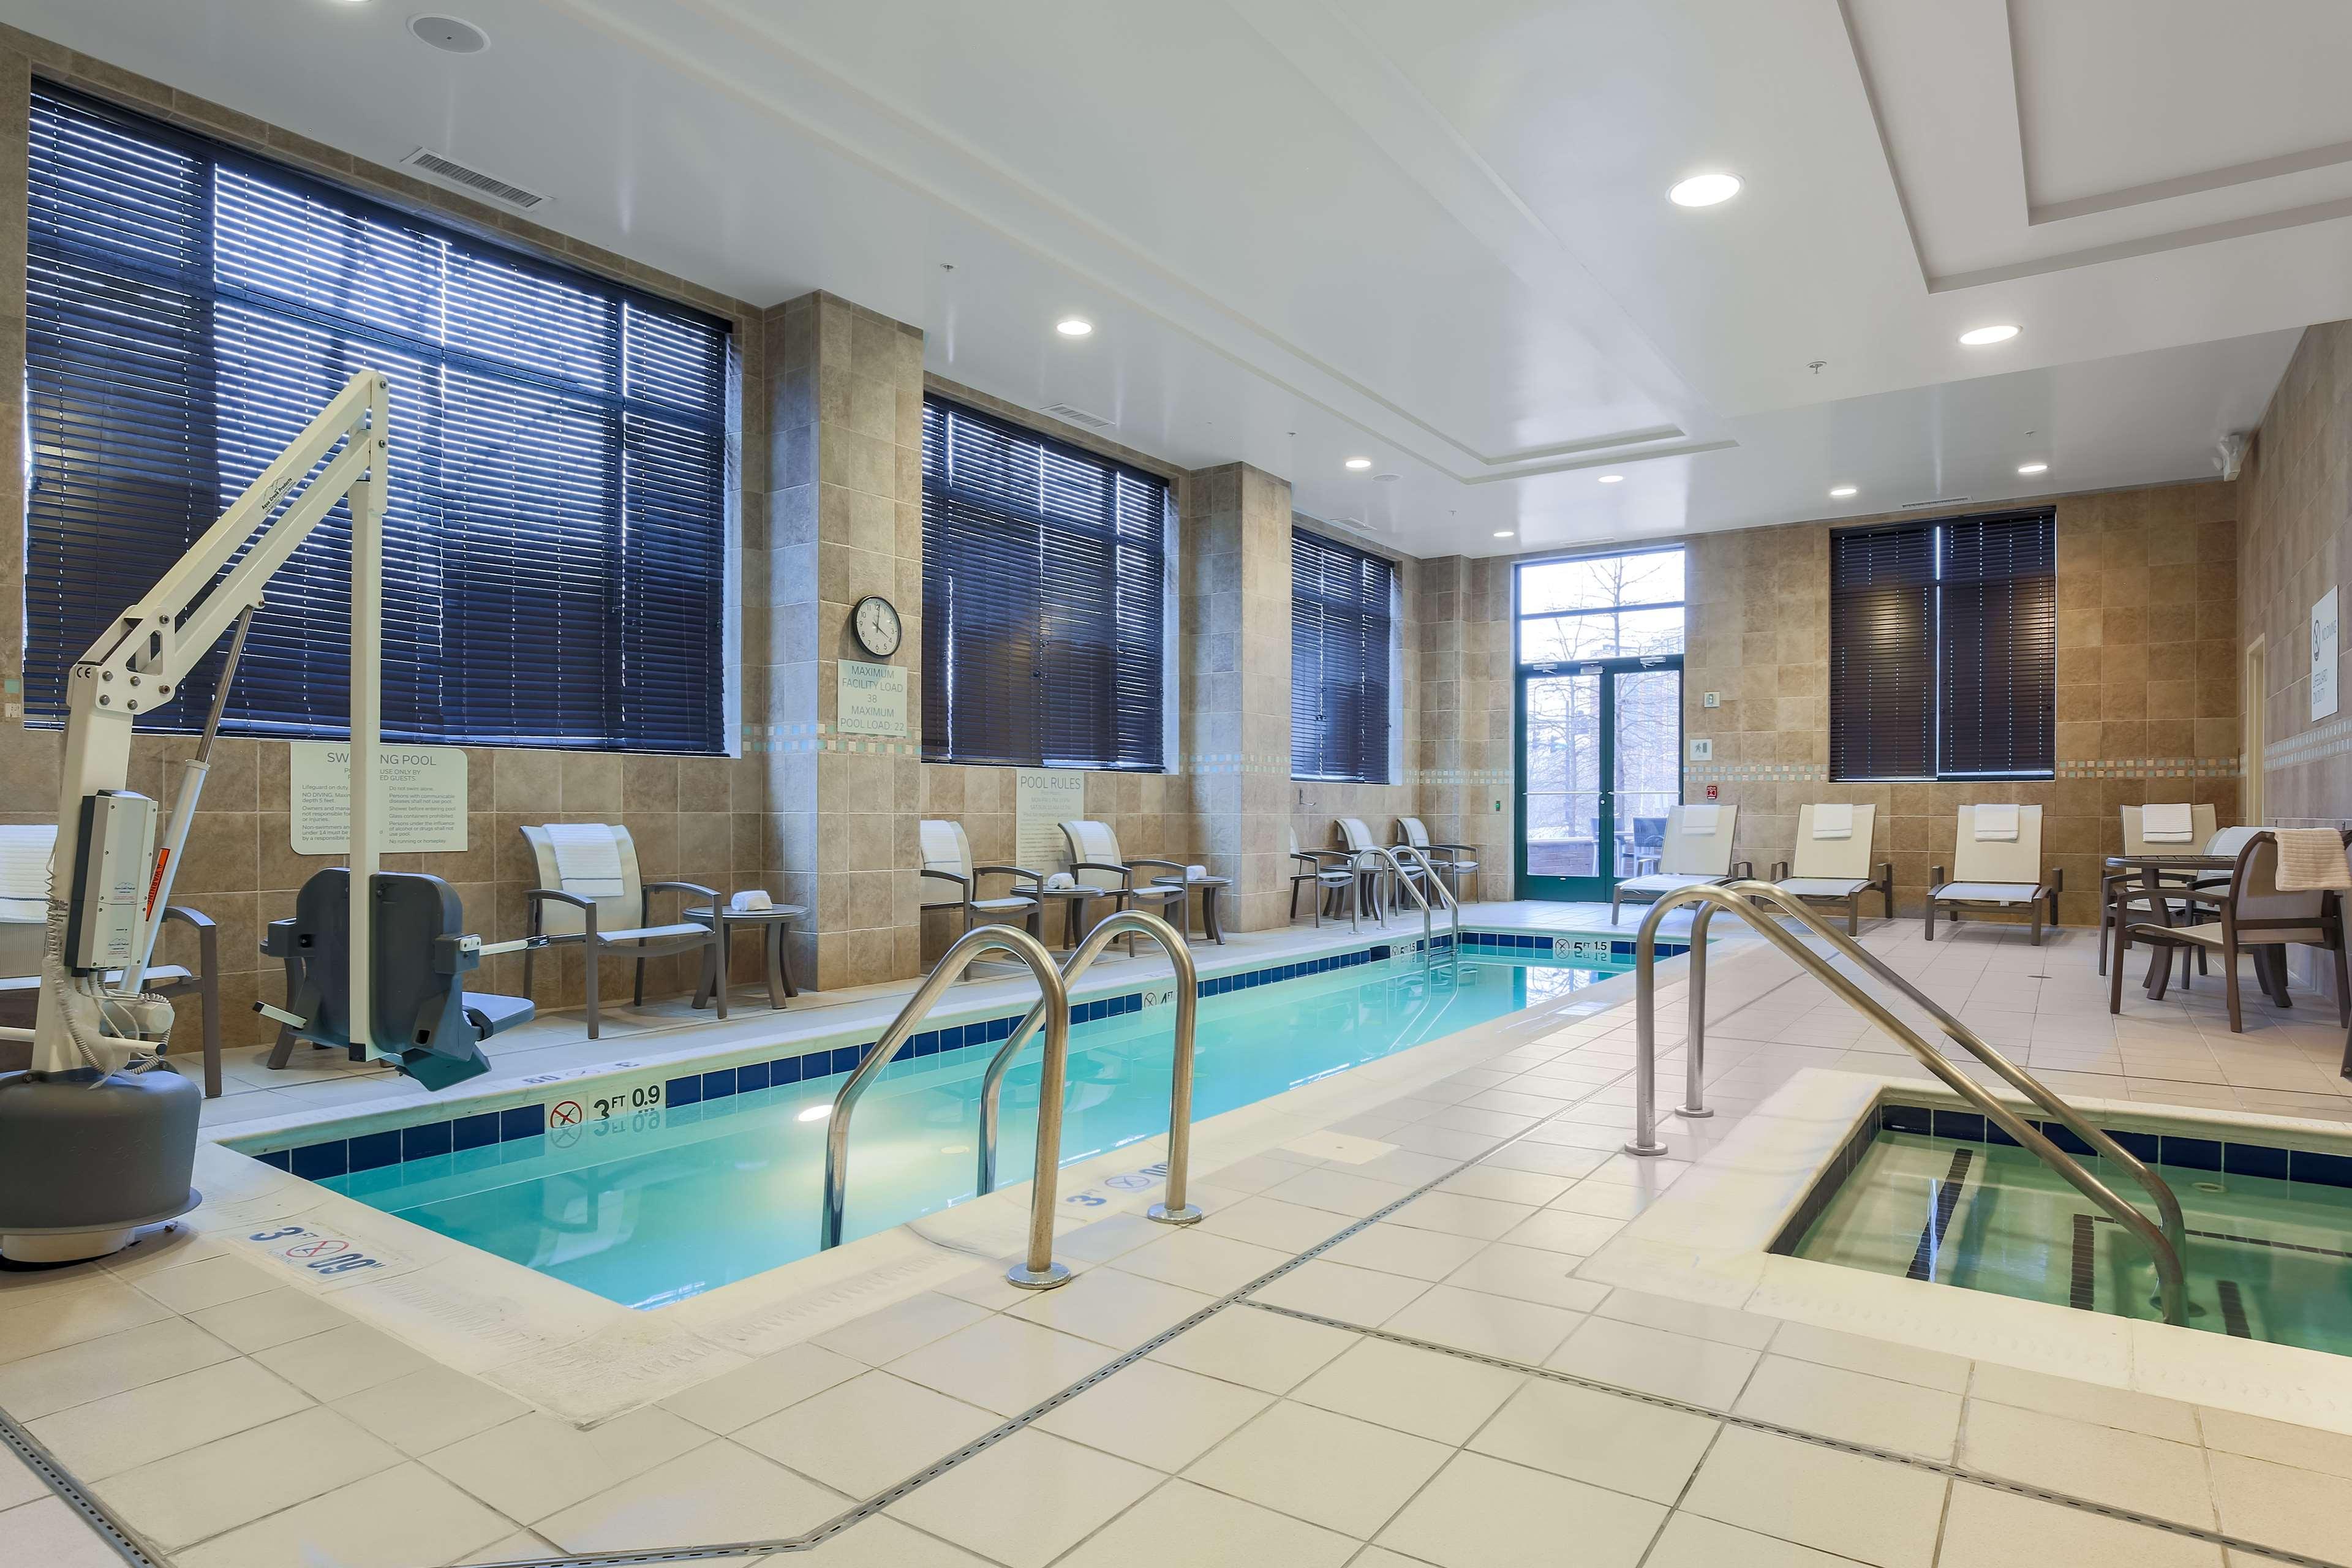 Hilton garden inn arlington shirlington arlington - Hilton garden inn crystal city va ...